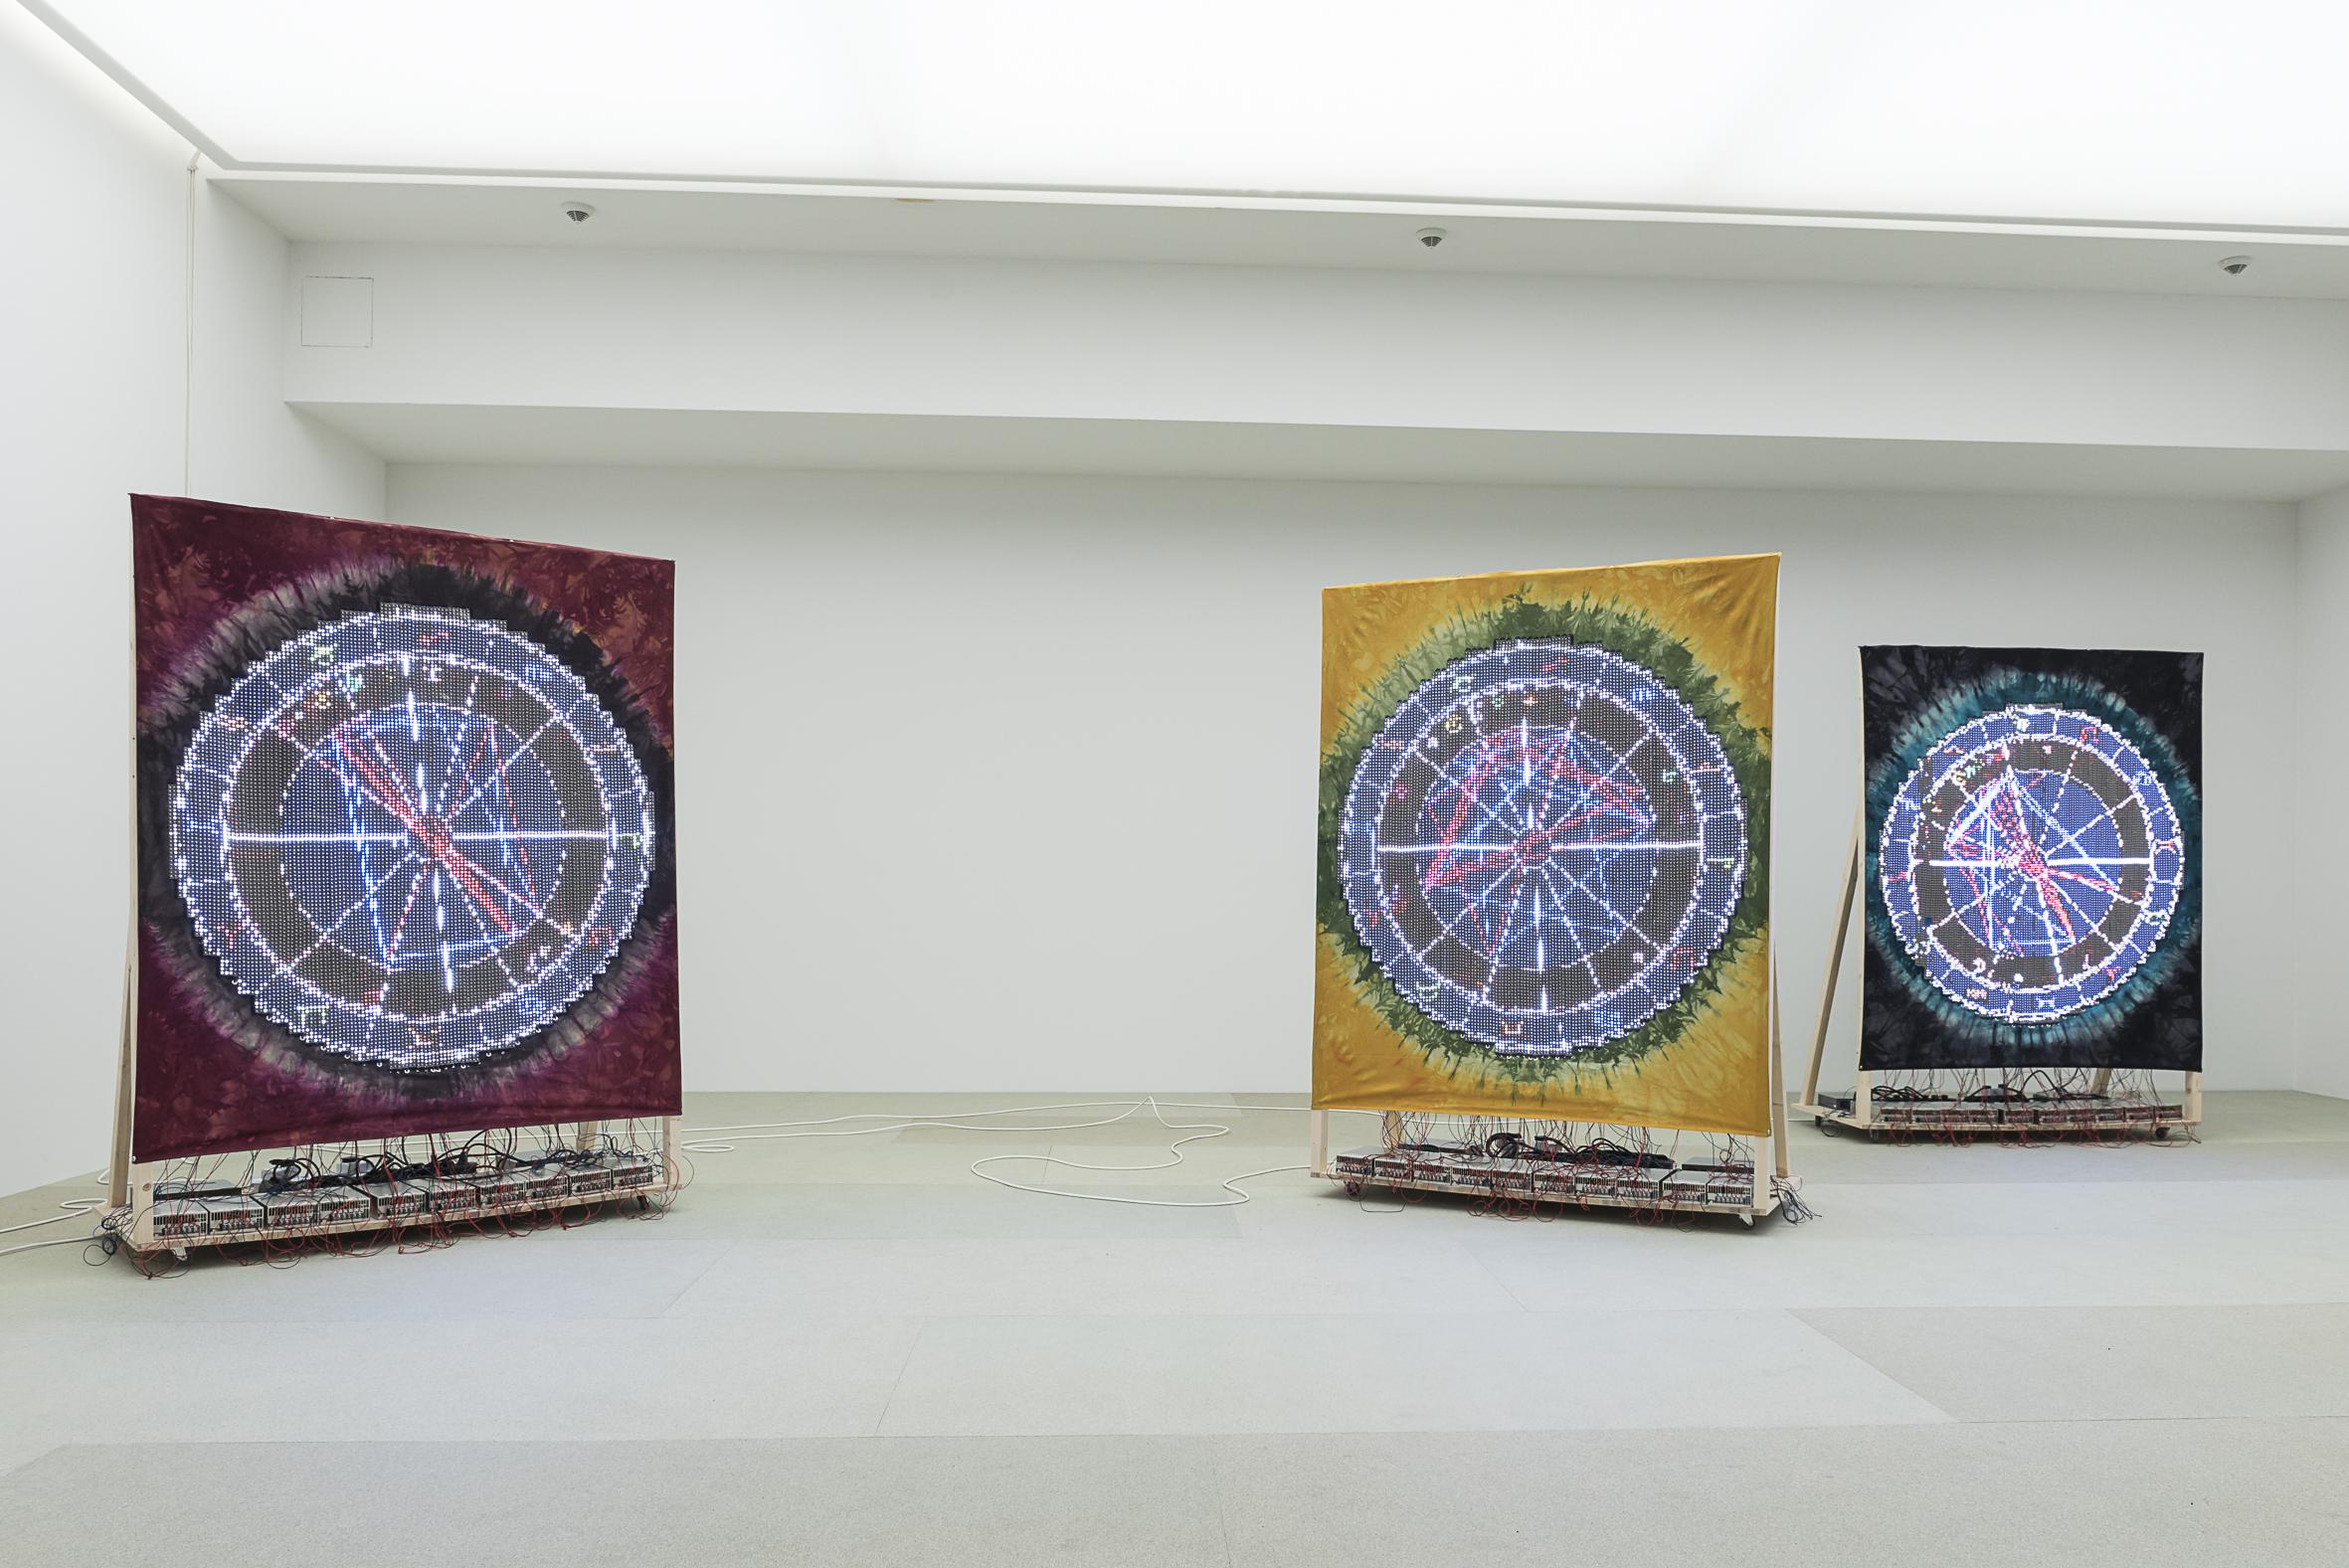 Kunstverein Düsseldorf